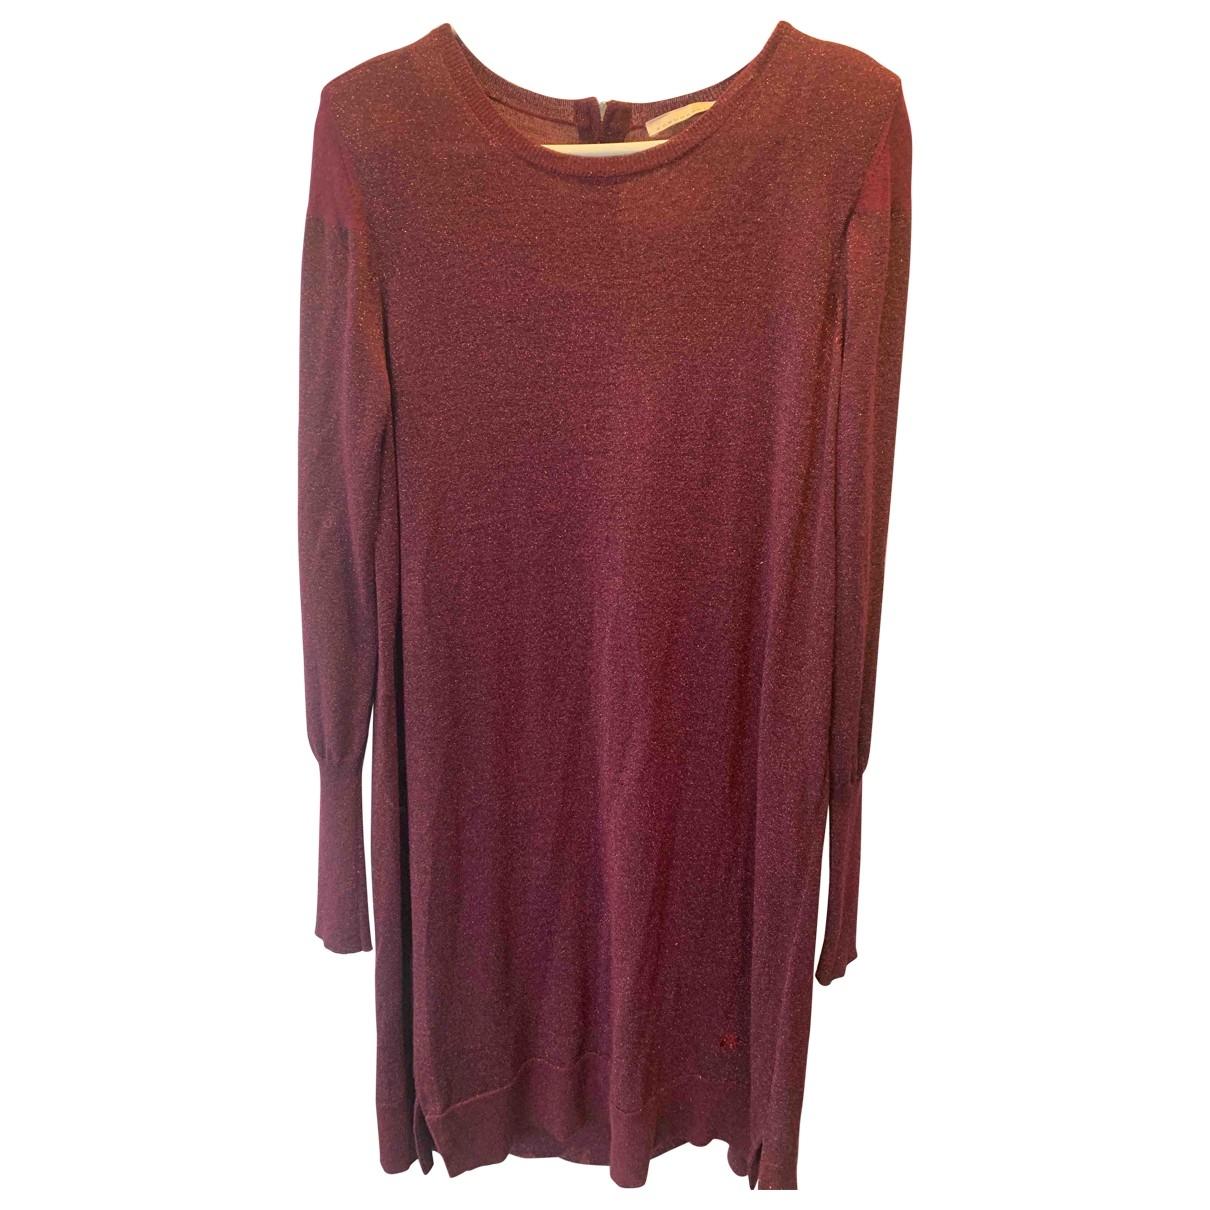 Schumacher \N Kleid in  Bordeauxrot Wolle